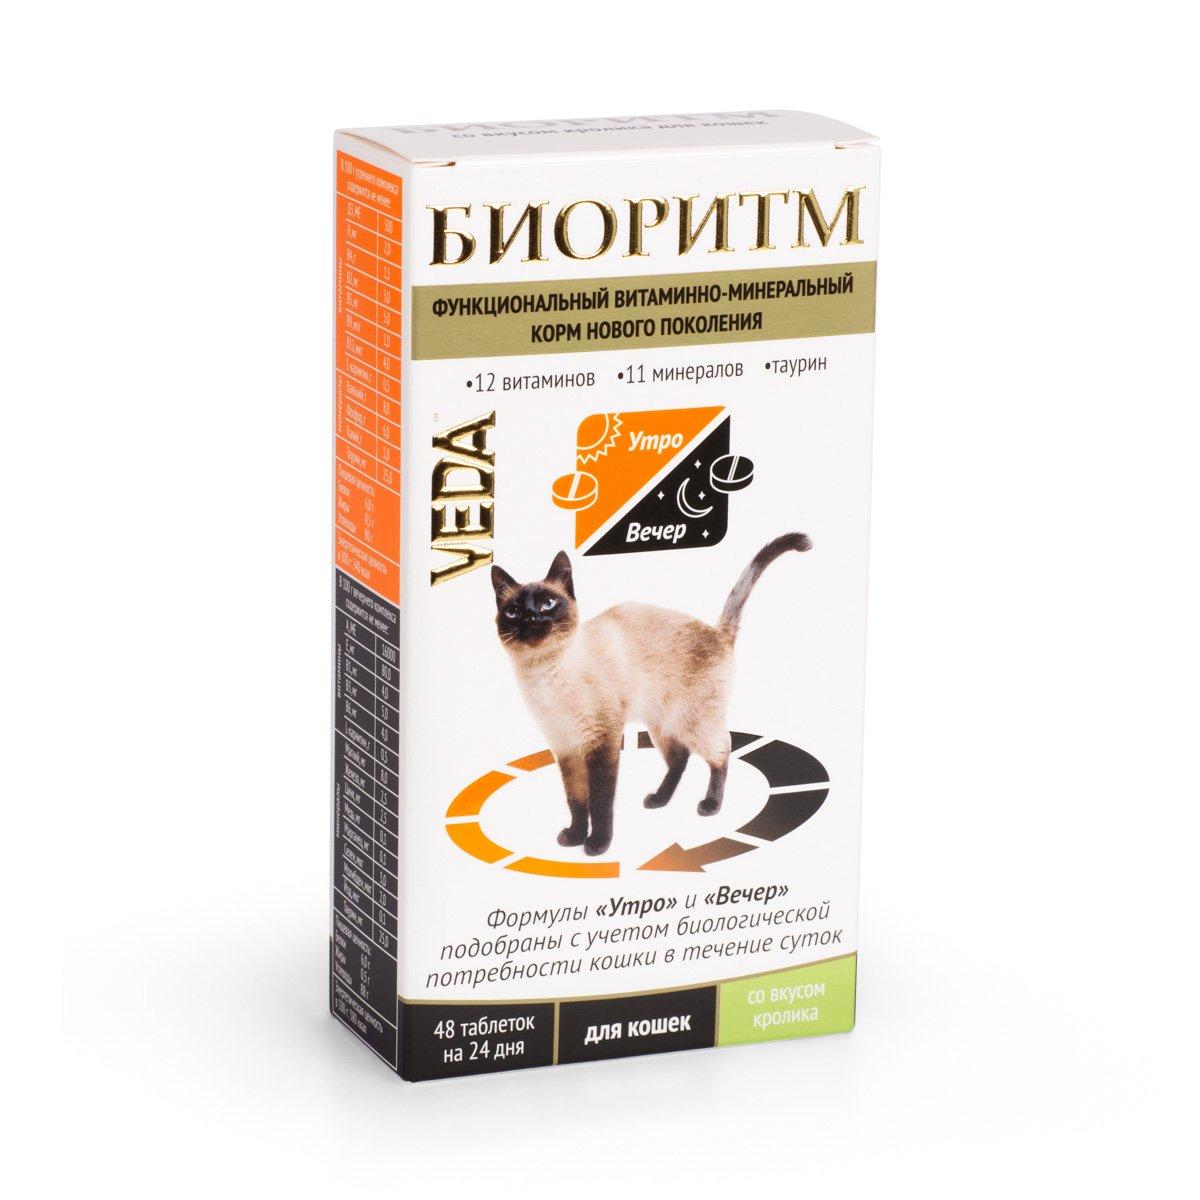 Витаминный корм для кошек